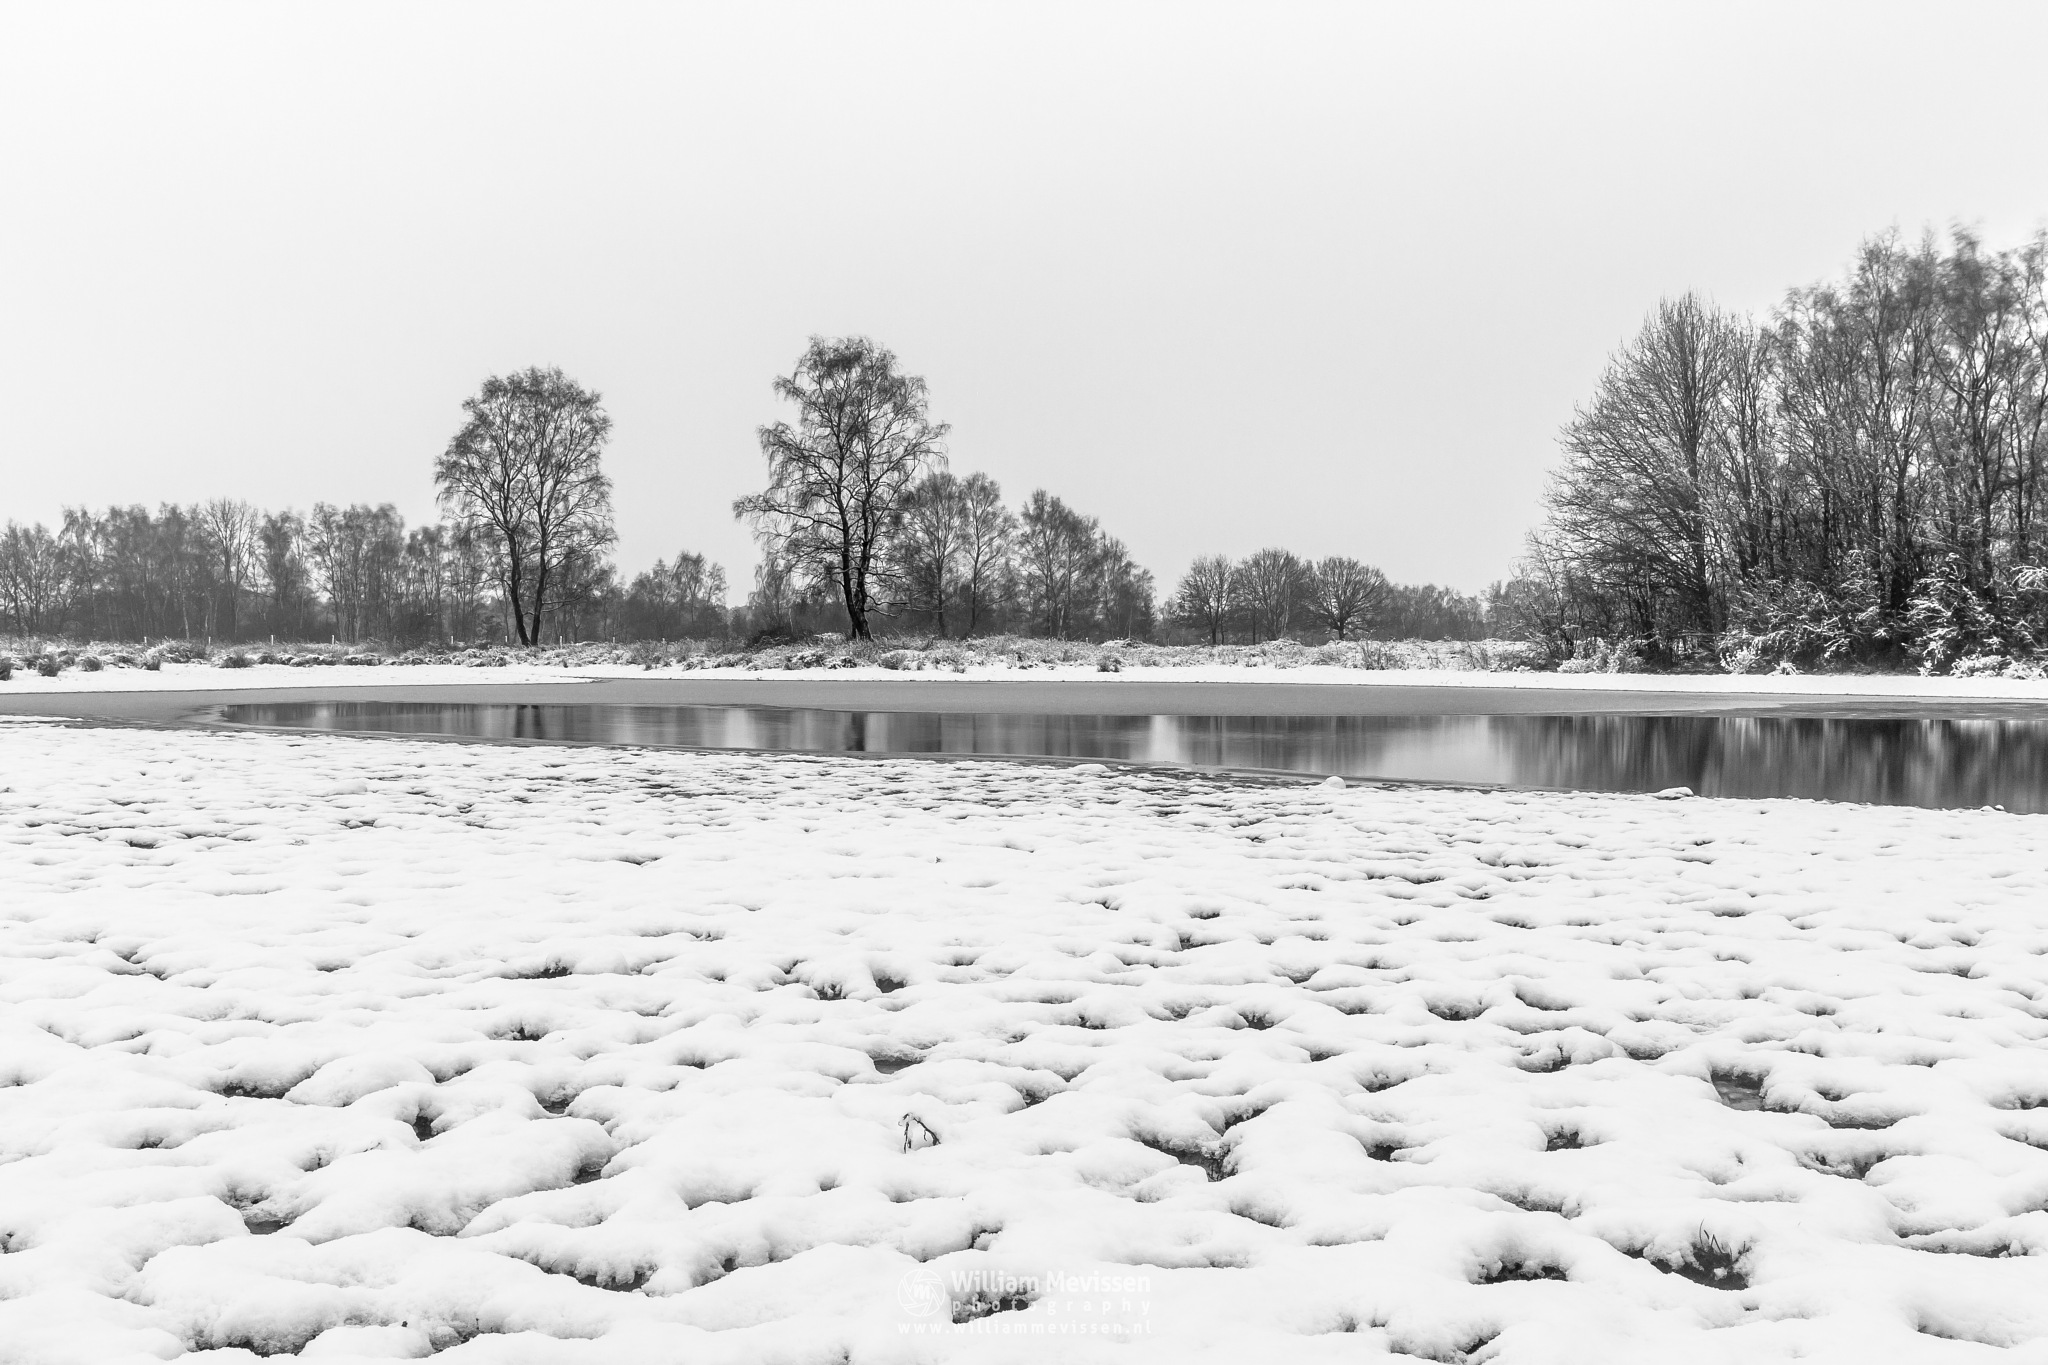 Cold Winter Rondven by William Mevissen